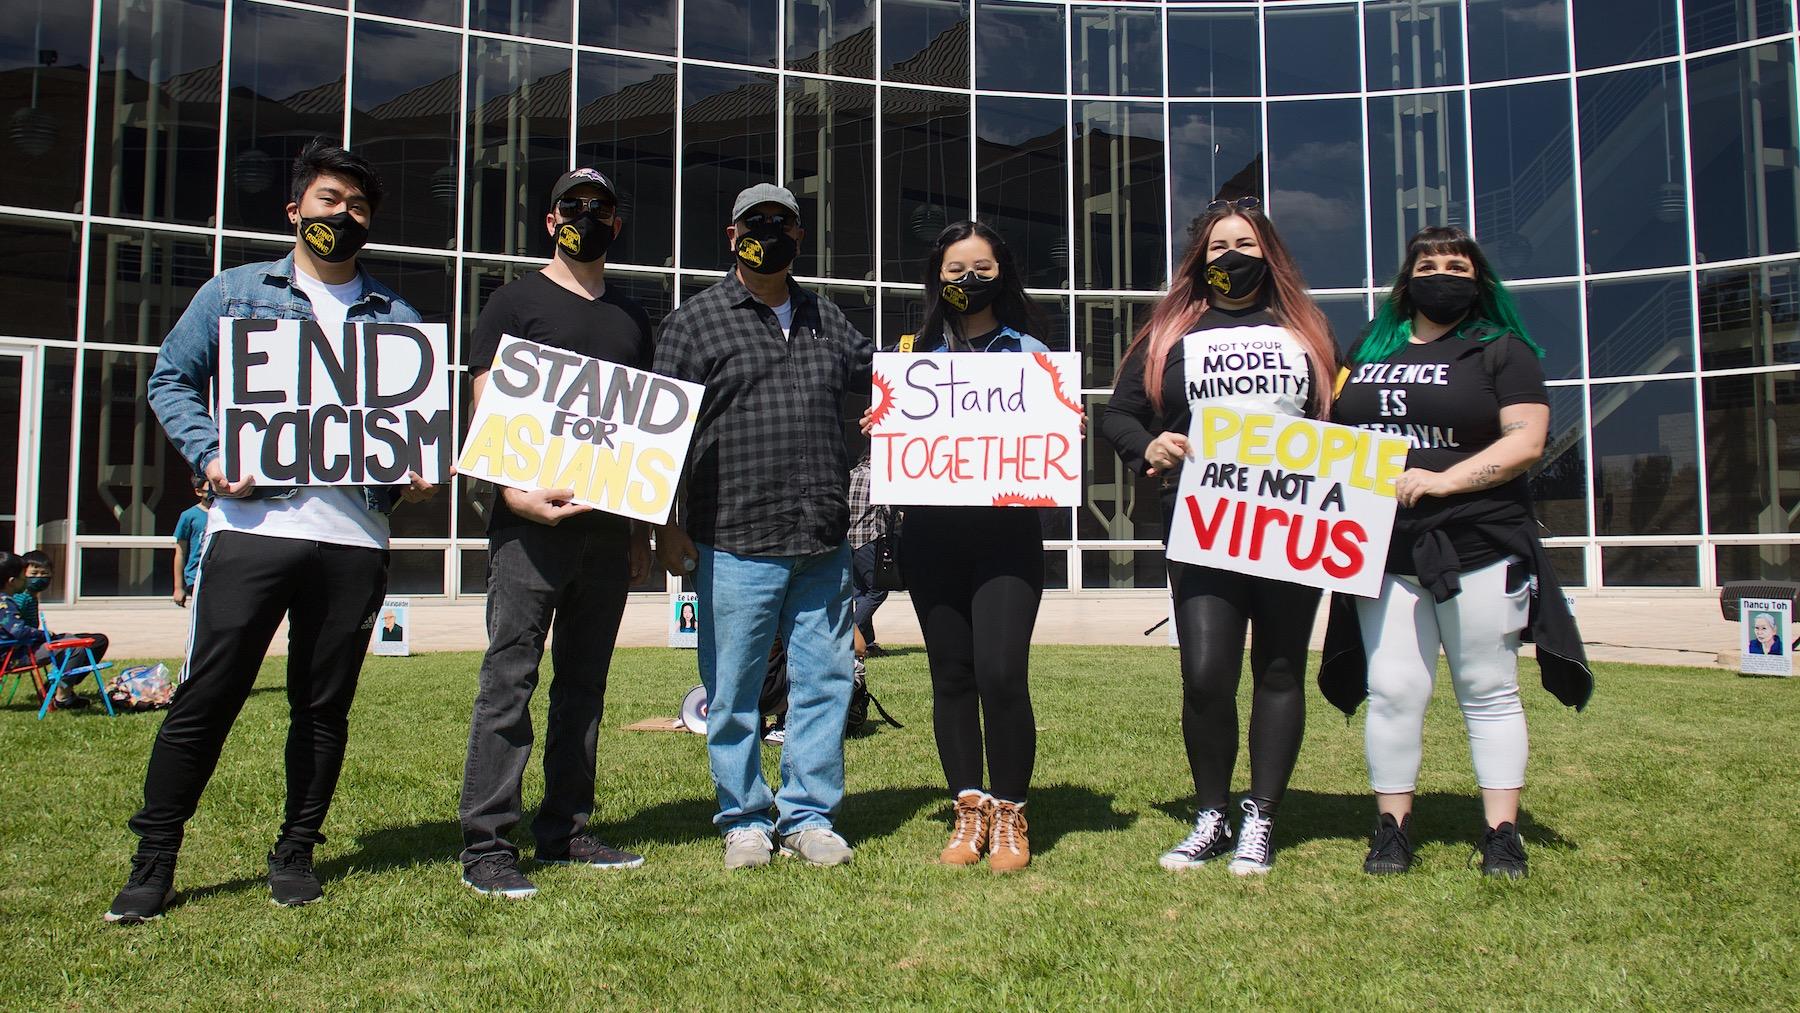 fullertonobserver.com: Rise in Hate Incidents Against Asian Americans Sparks Calls for Solidarity